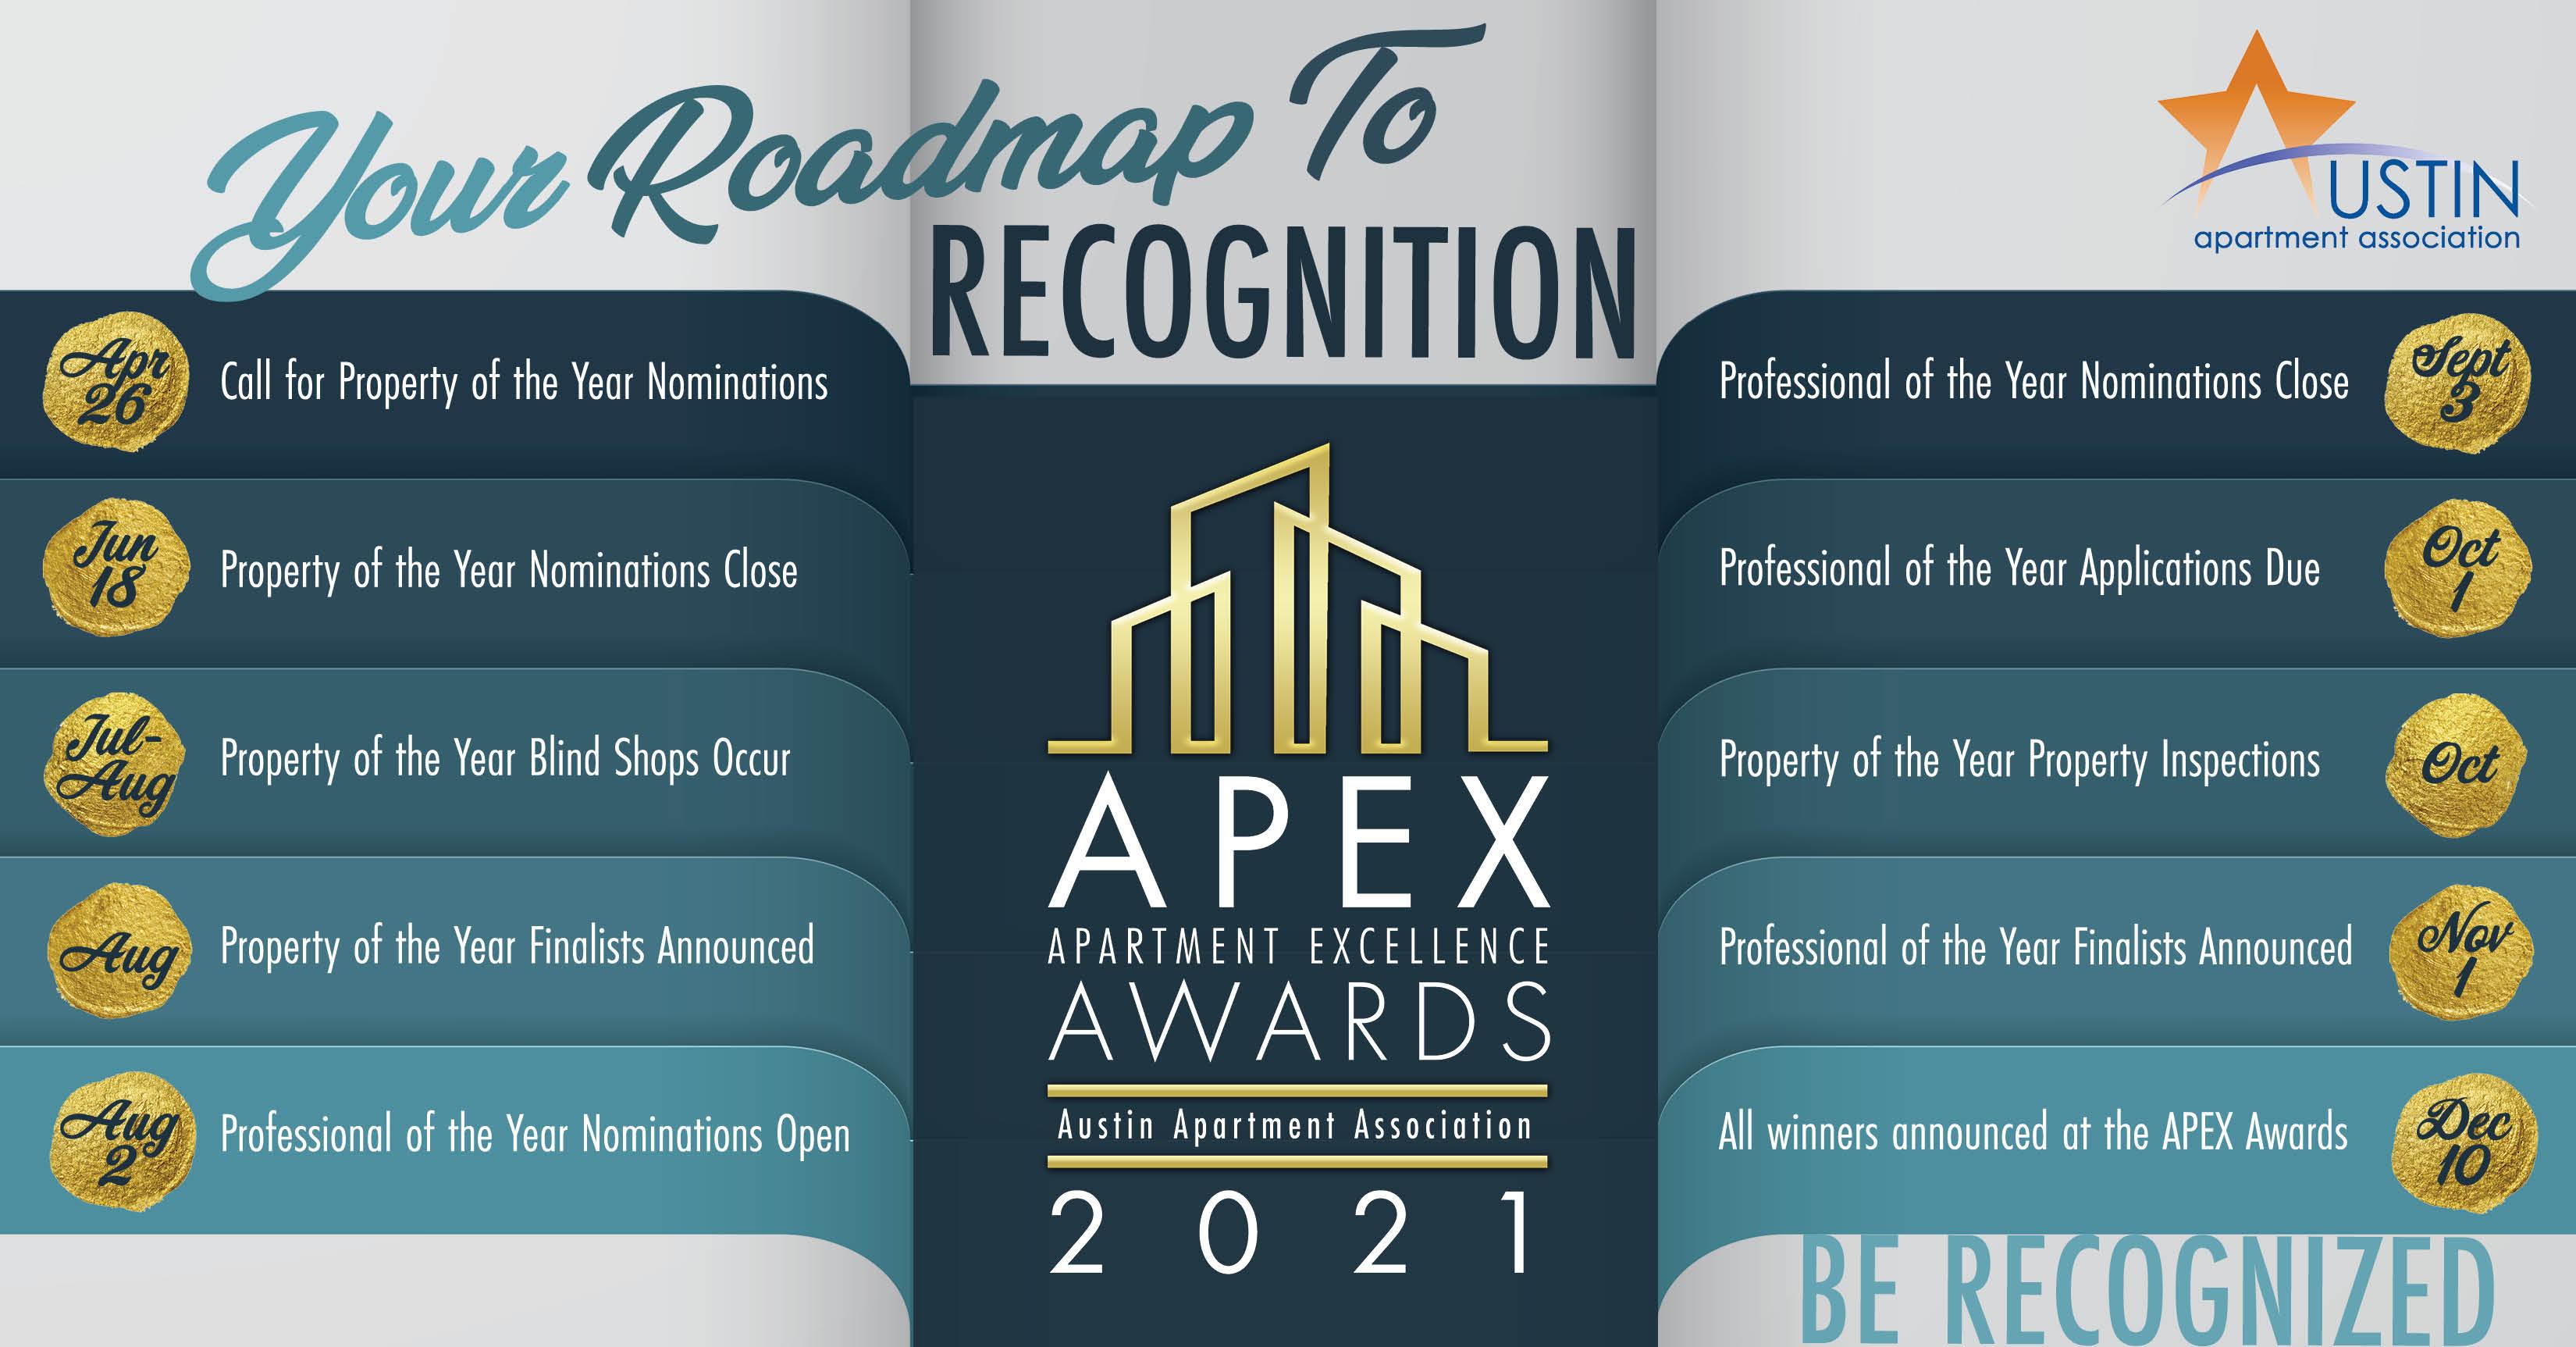 APEX key dates 2021